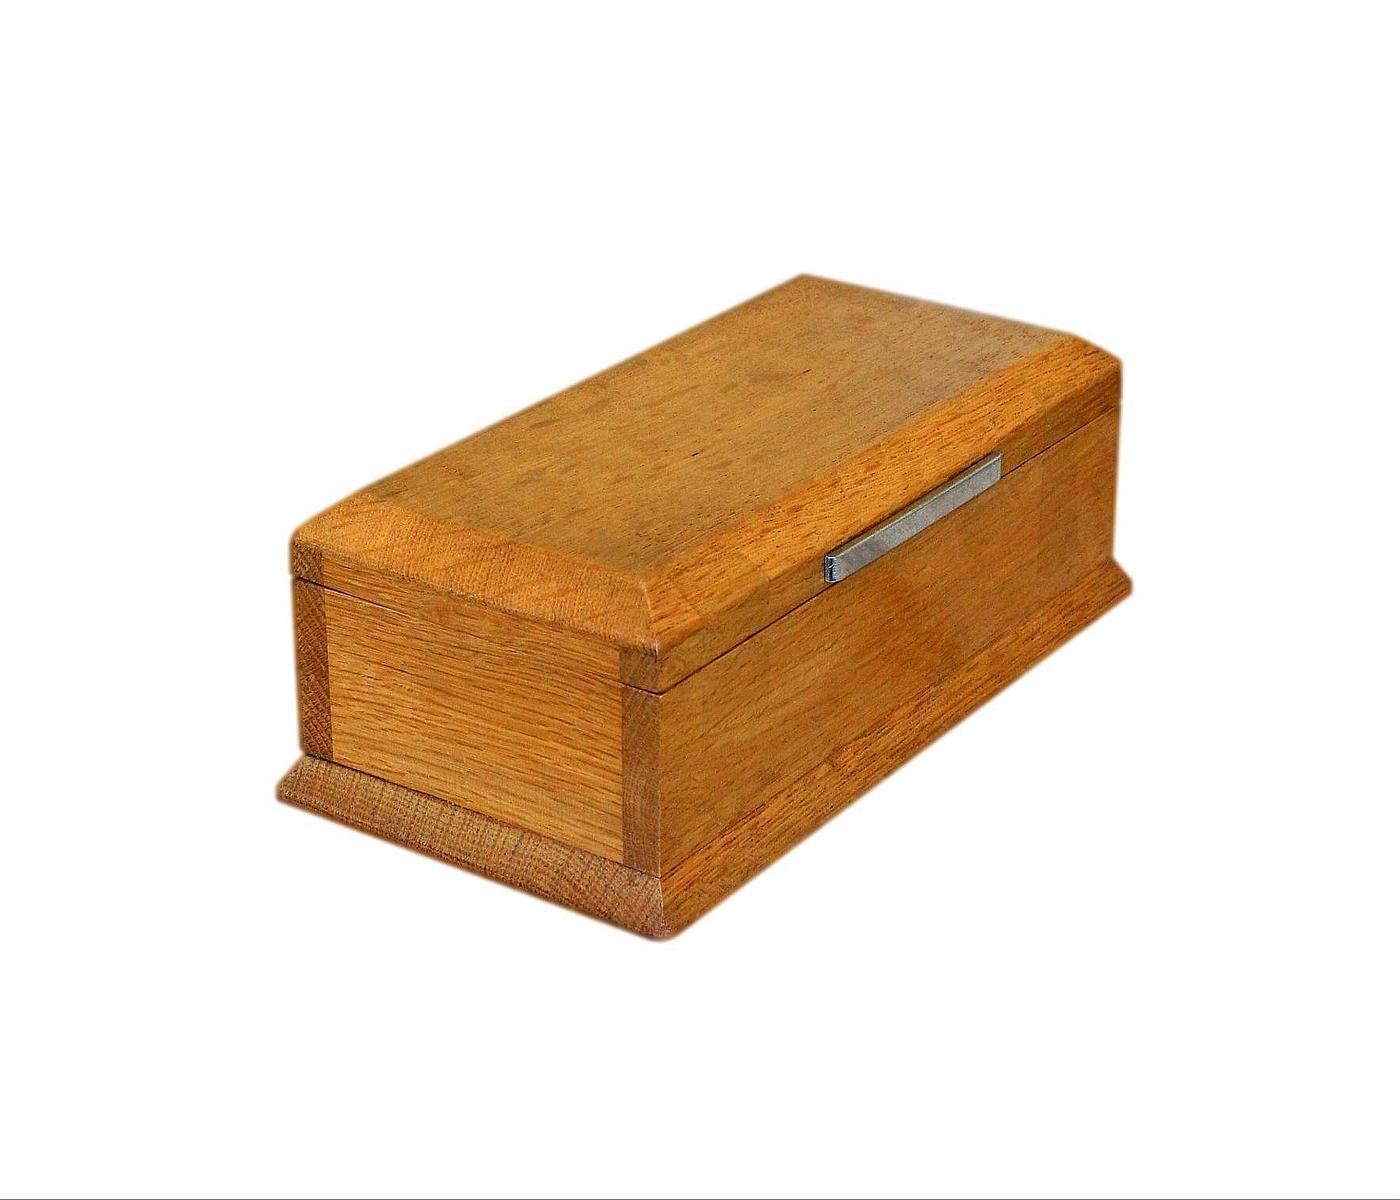 Beautifully Refurbished Solid Oak Art Deco Jewellery Box